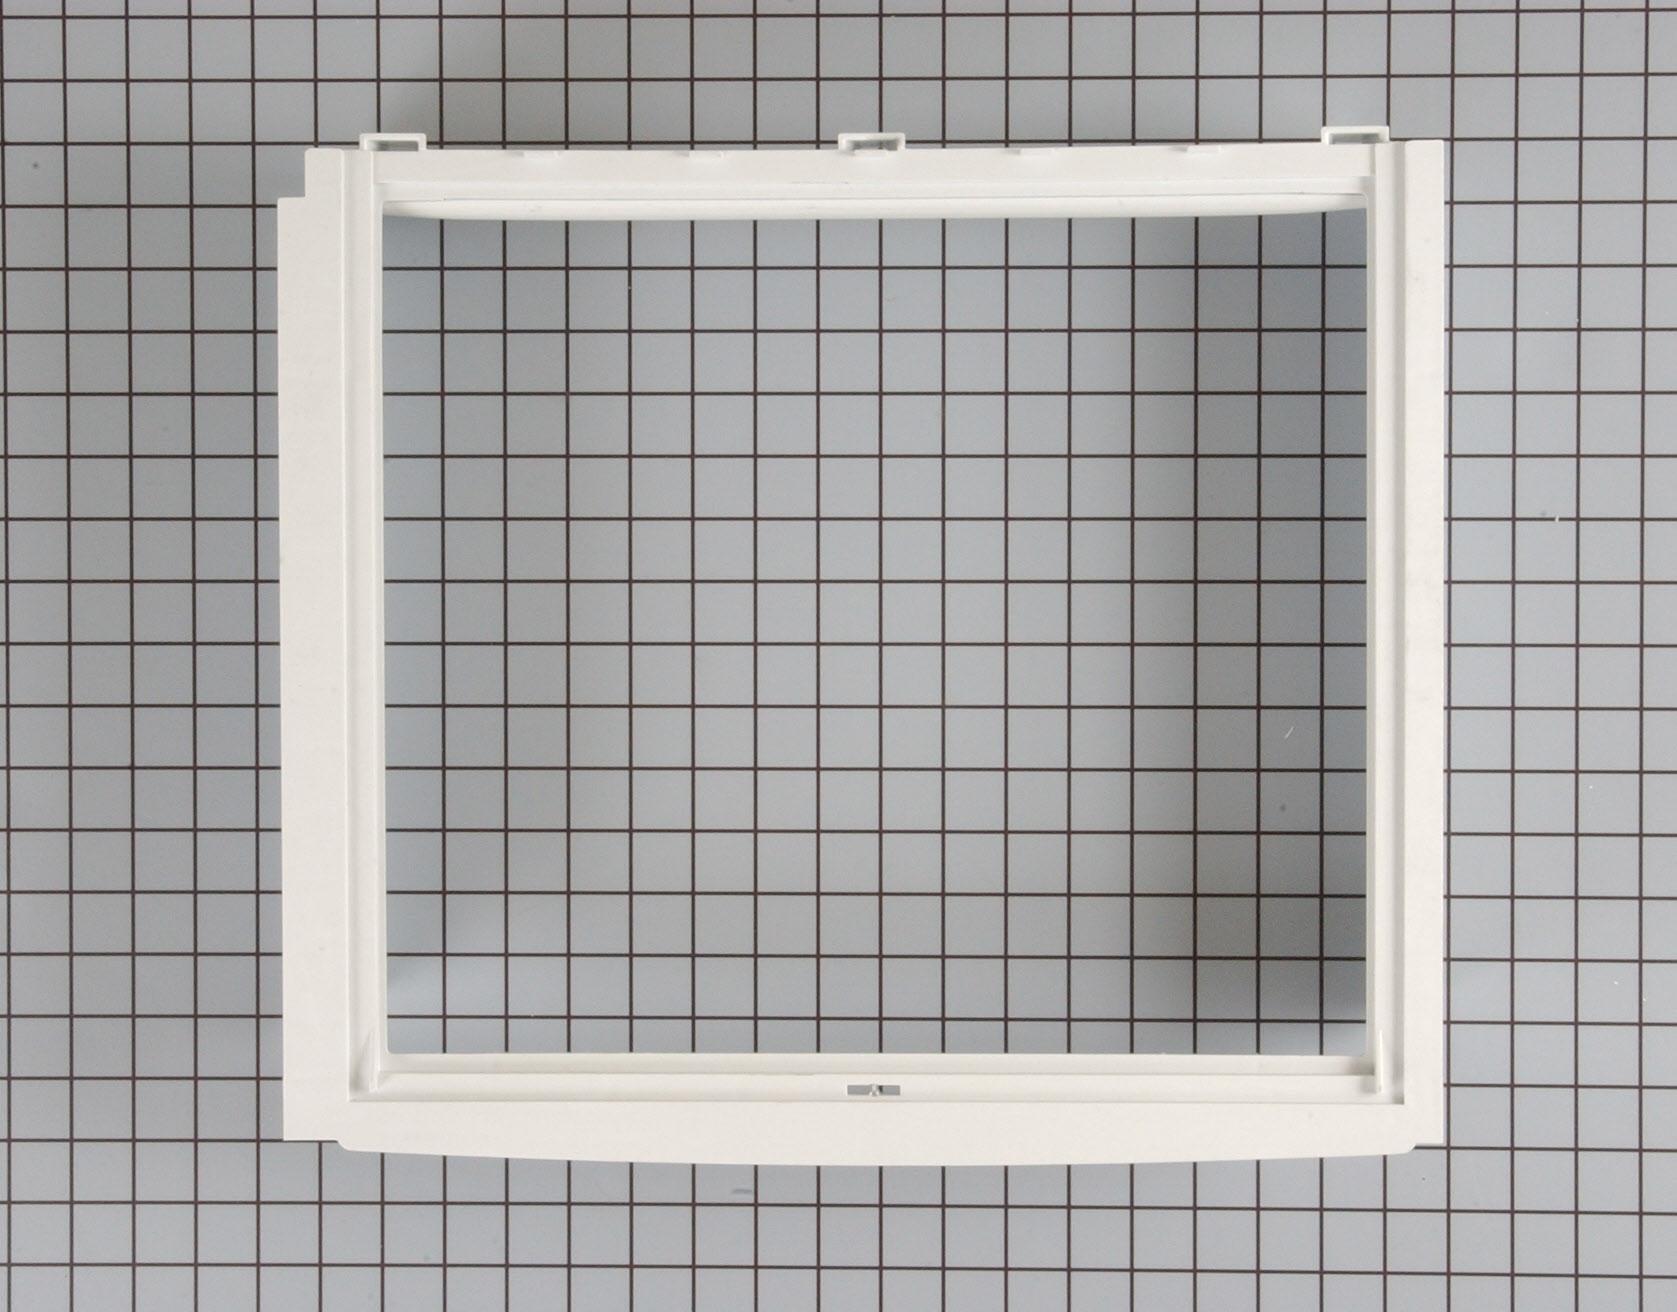 WP67004531 Gaggenau Refrigerator Part -Crisper Cover